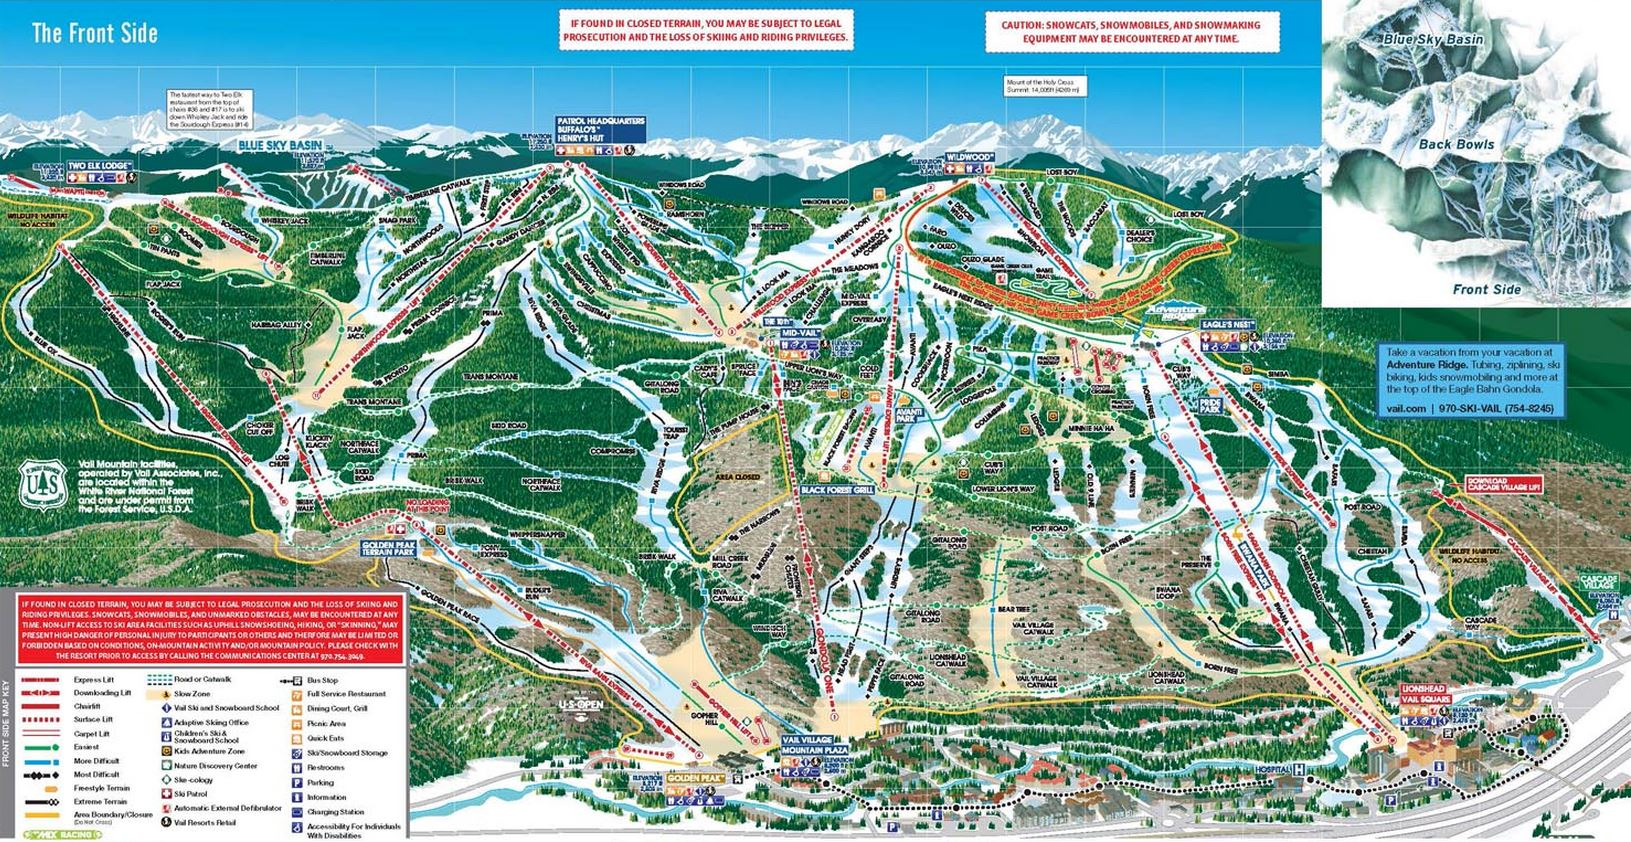 Best Kitchen Gallery: Vail Ski Packages Vail Lodging Deals Skisync of Vail Ski Resort on rachelxblog.com